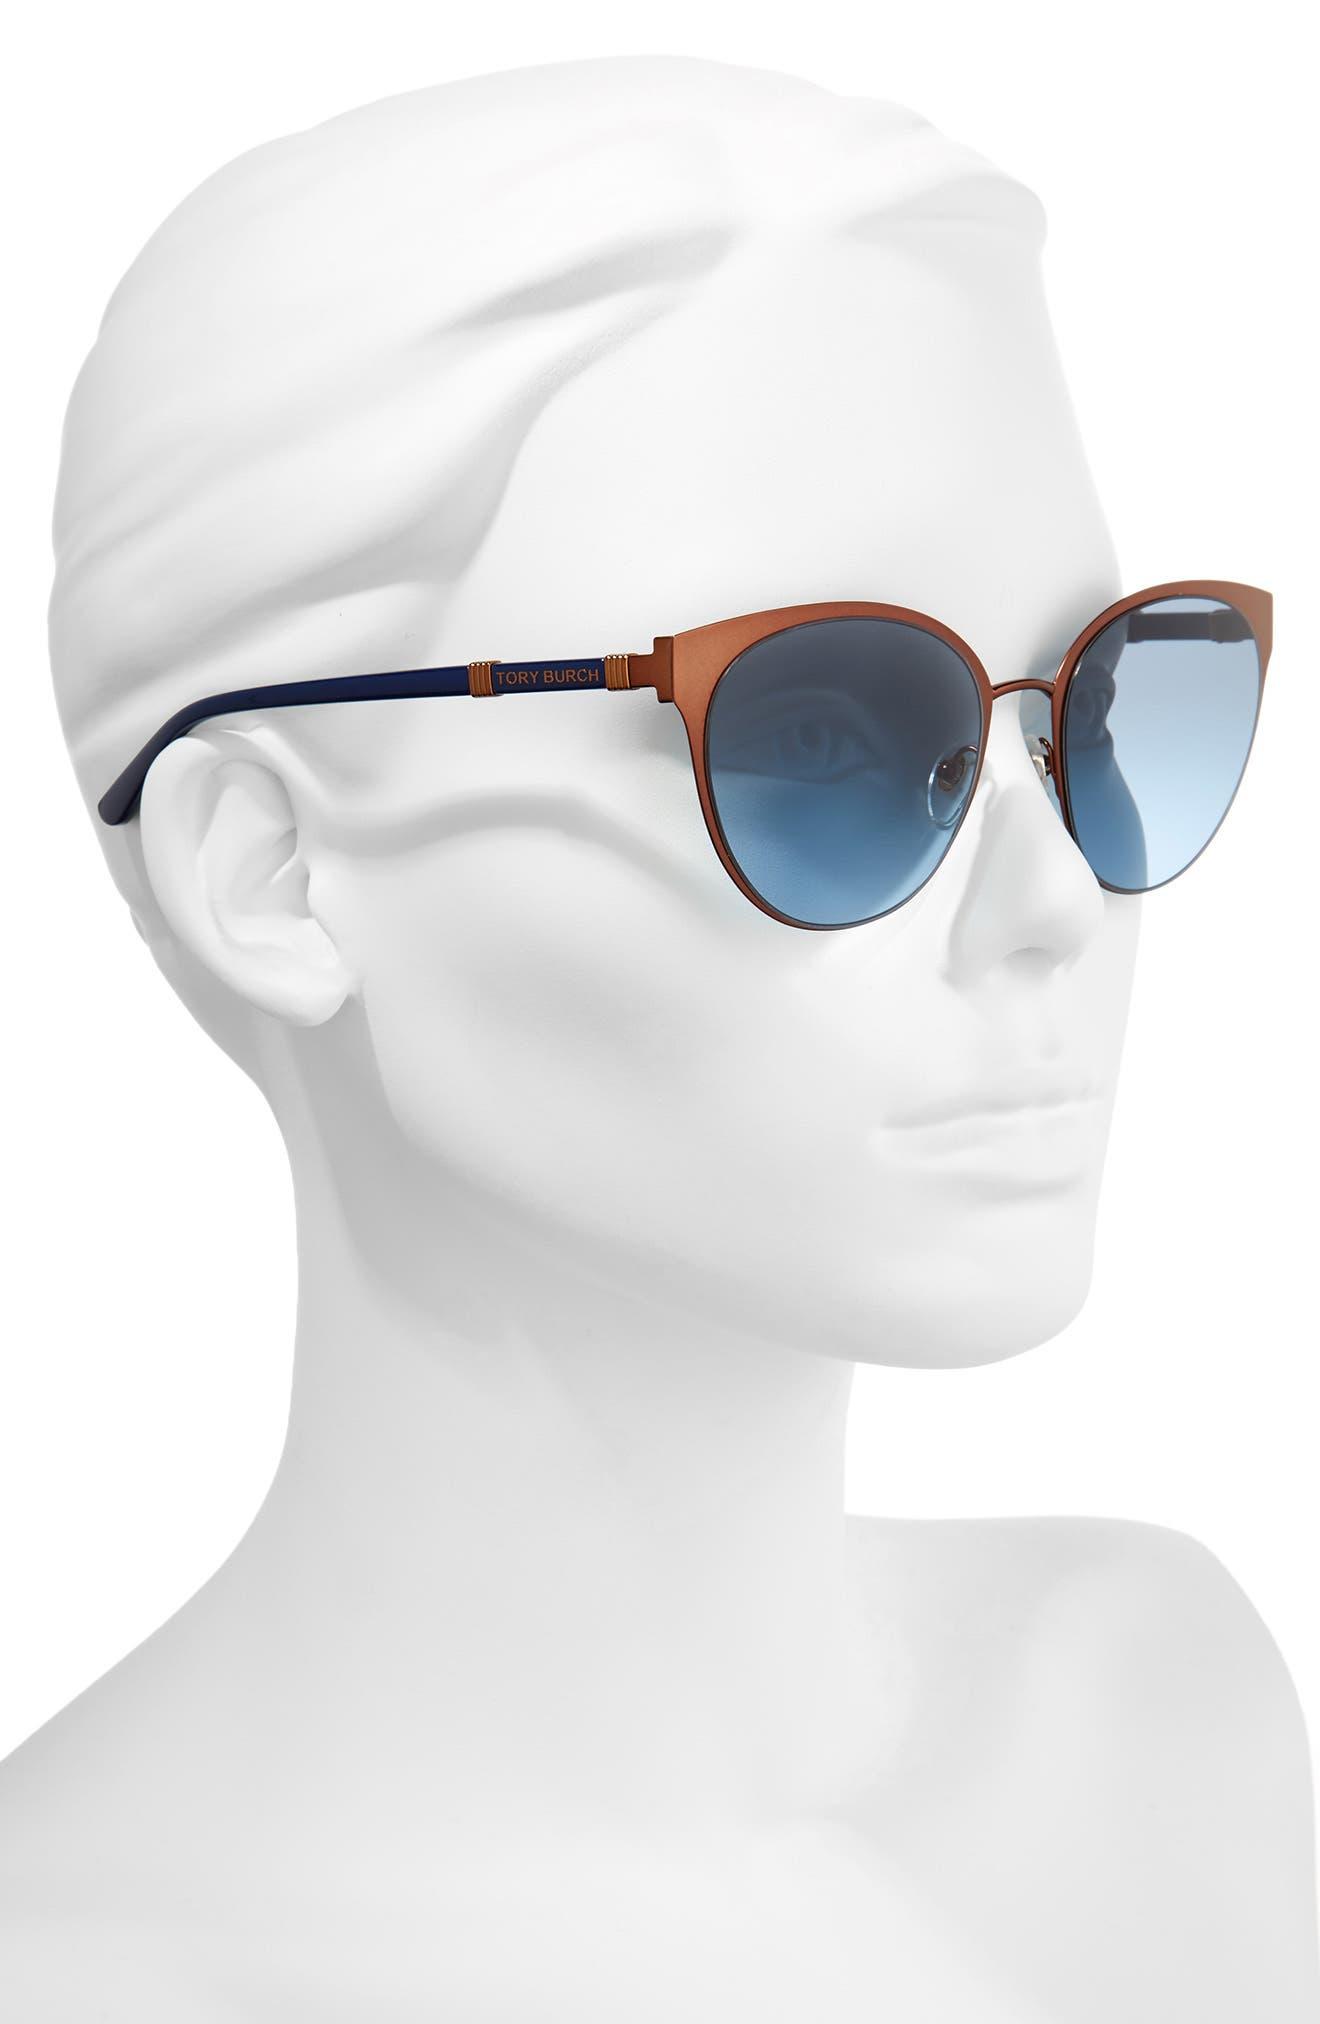 55mm Cat Eye Sunglasses,                             Alternate thumbnail 2, color,                             220